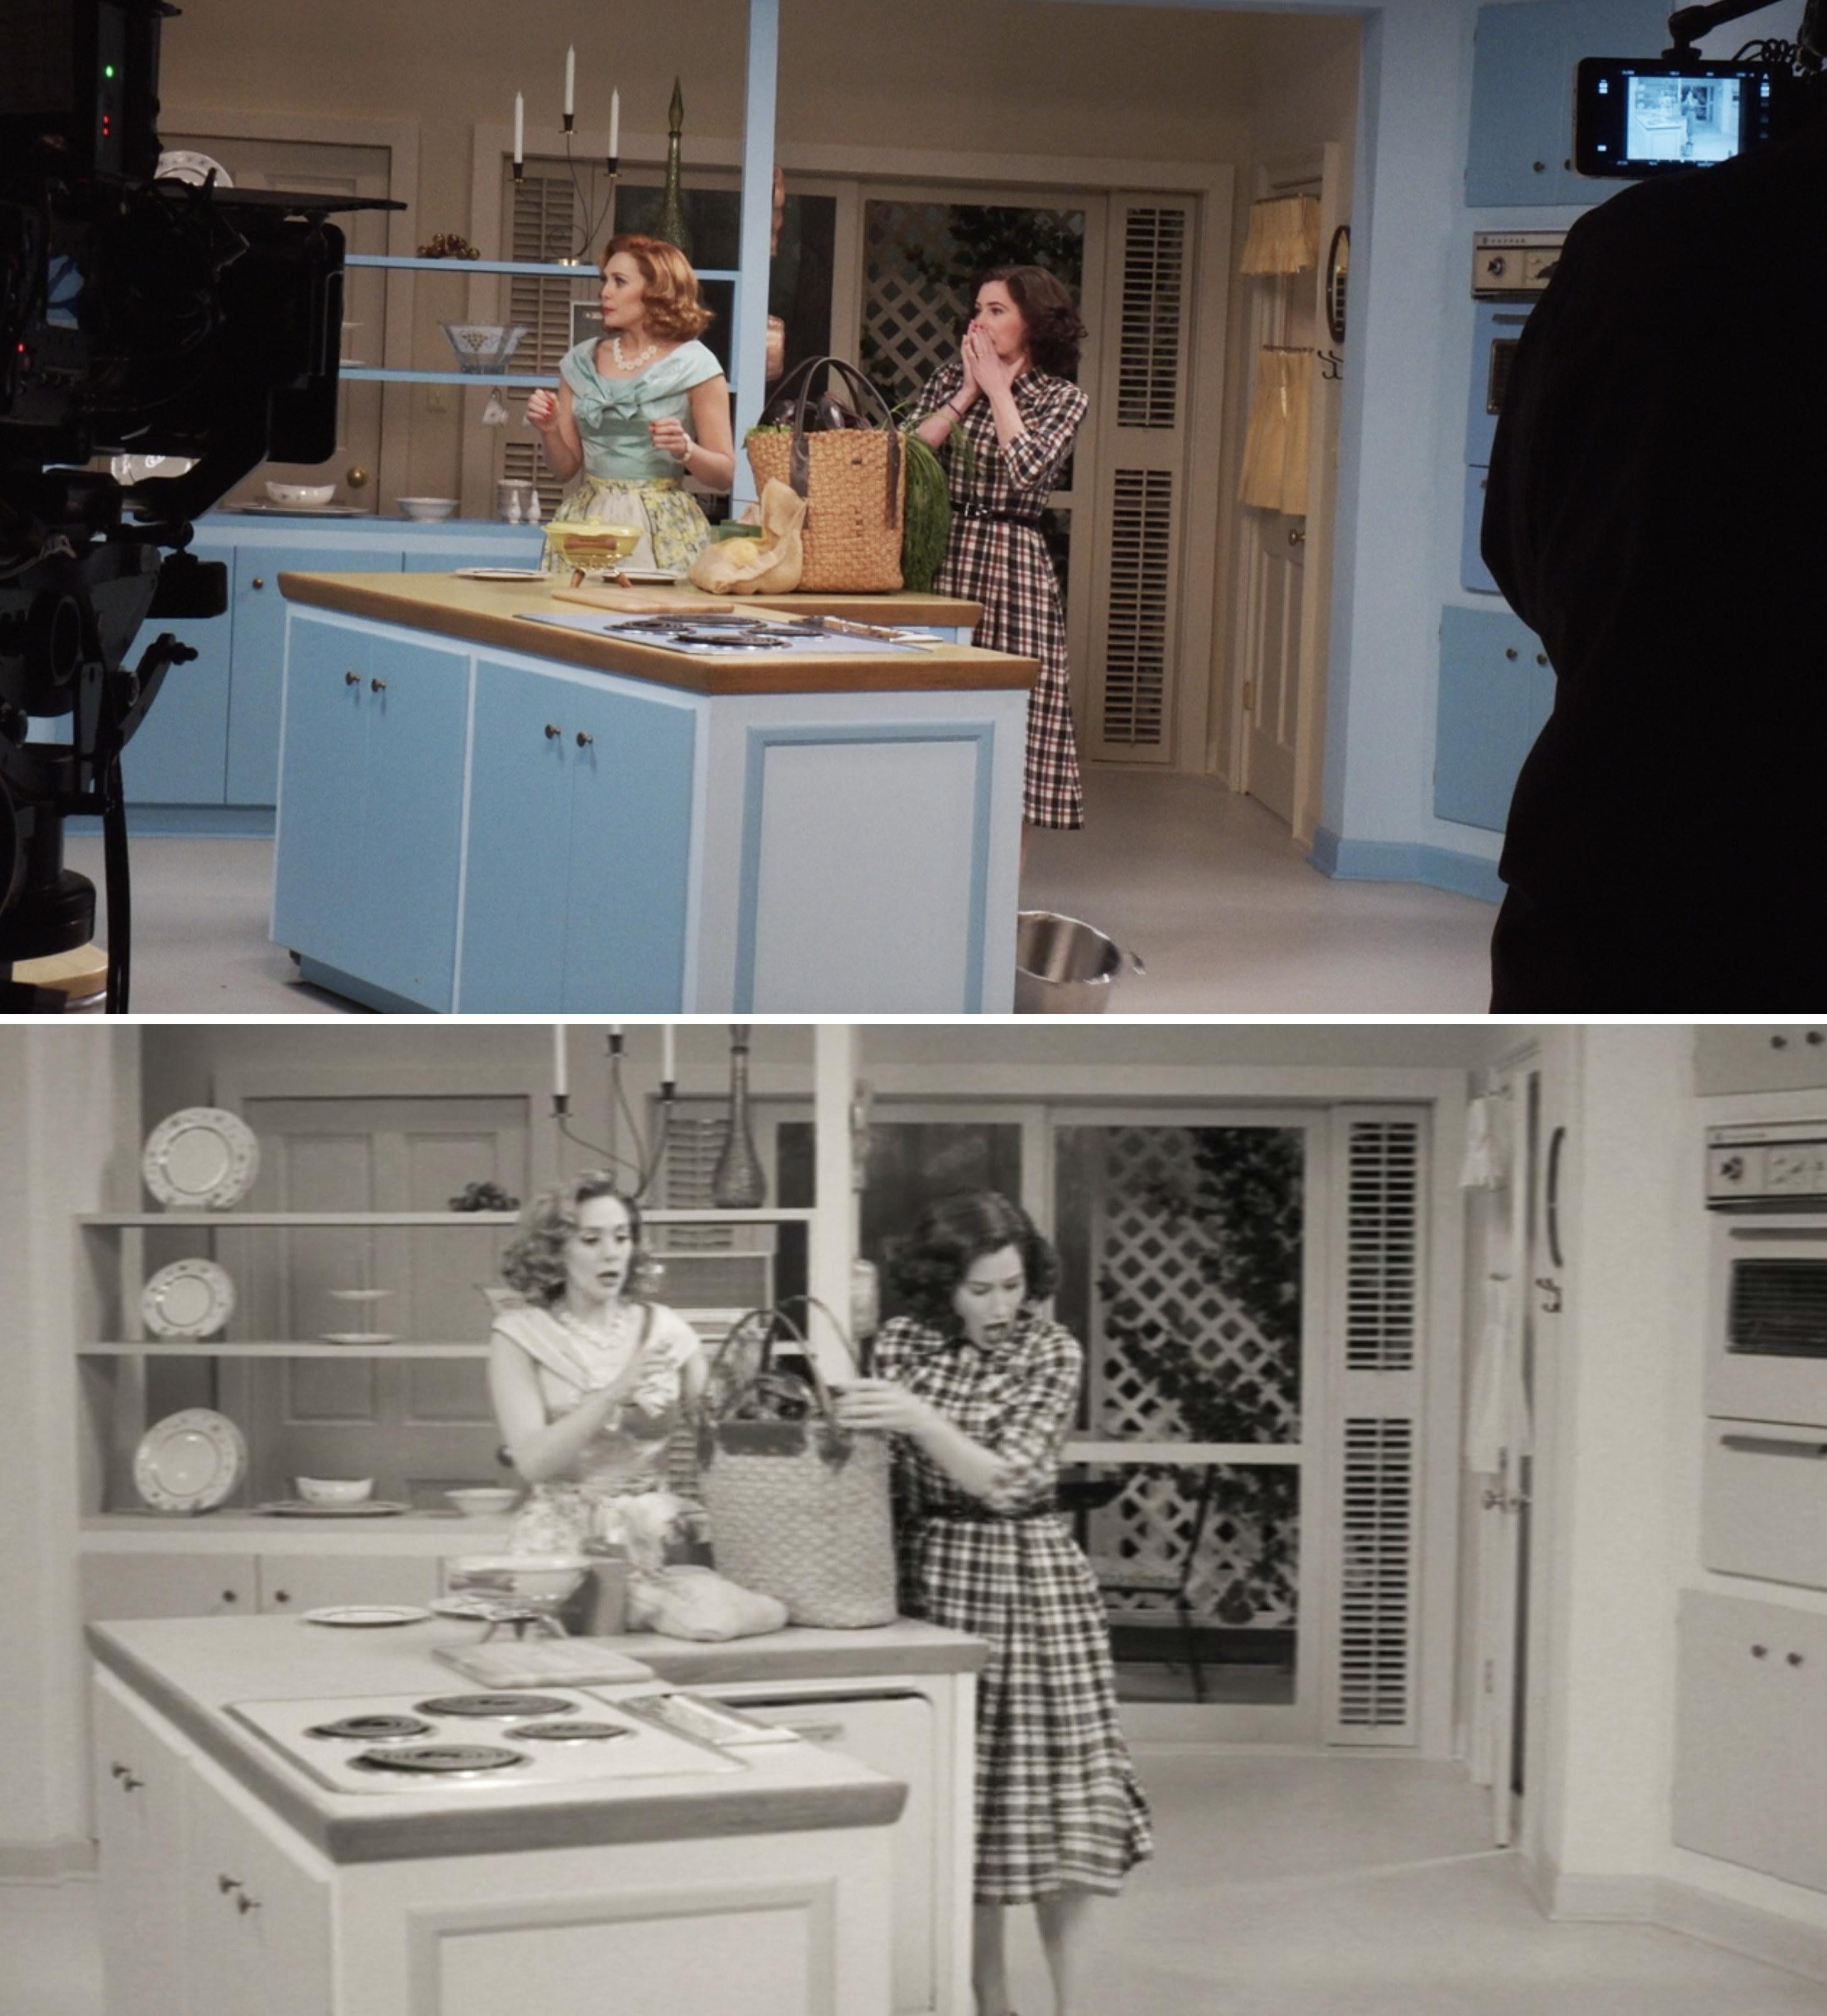 Elizabeth Olsen and Kathryn Hahn filming in Wanda and Vision's kitchen in Episode 1